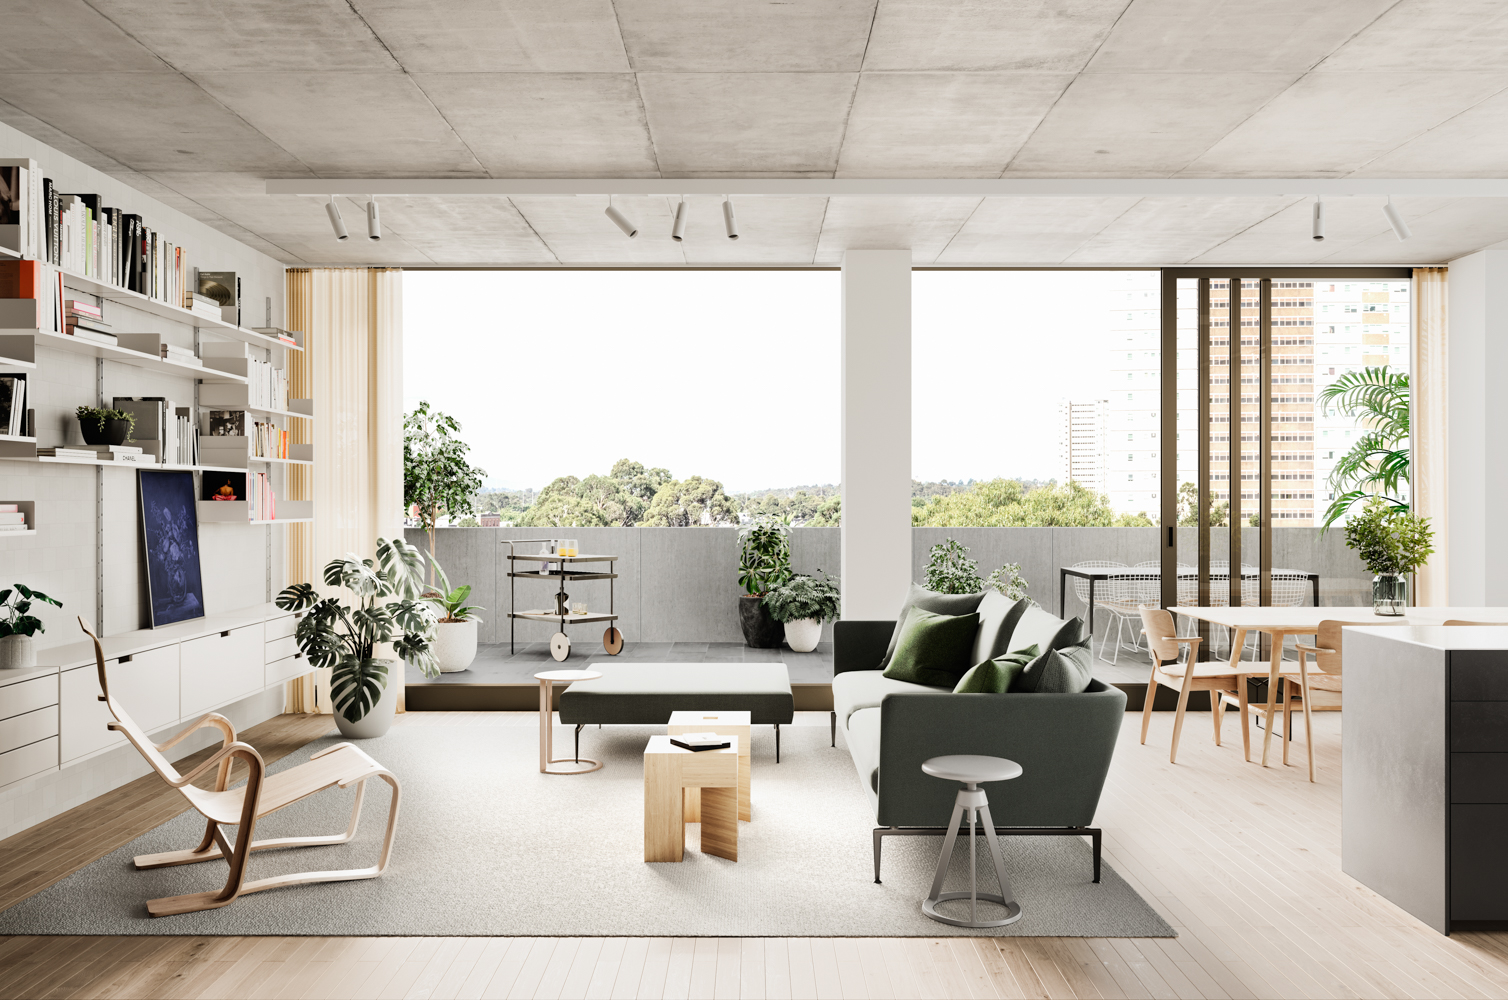 bedford-street-dko-architecture-milieu-property-the-design-emotive-04.jpg